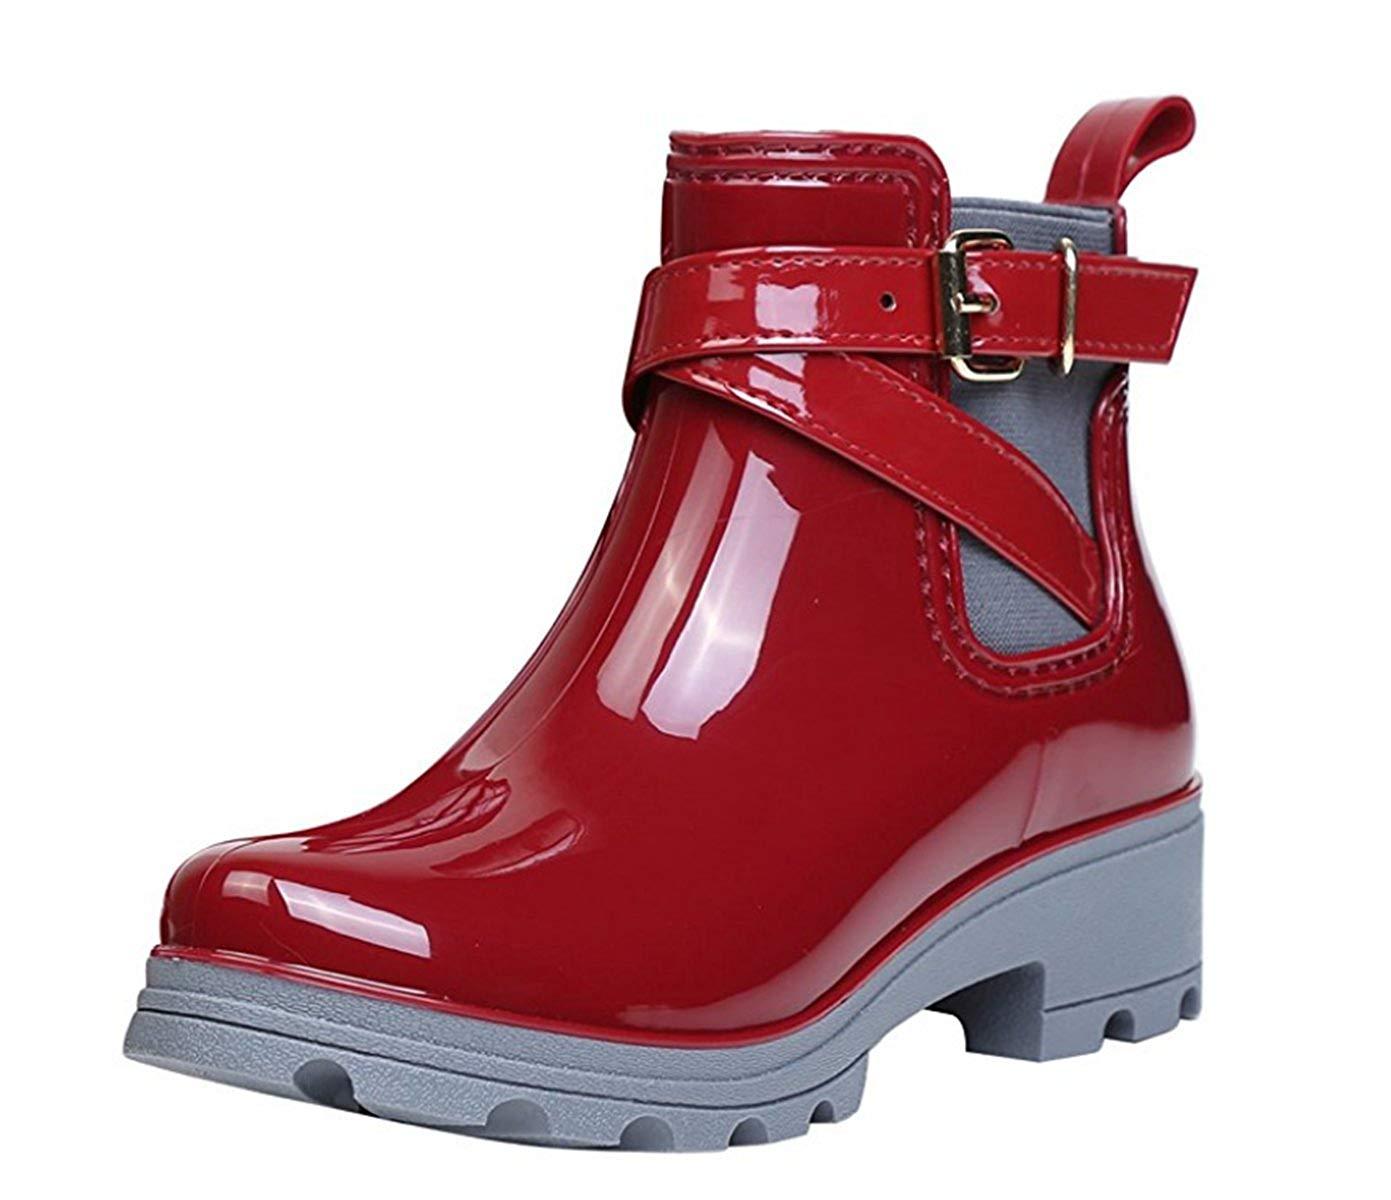 38f2613ce36b Get Quotations · Womens Rain Boots Platform Slip On Ankle Booties Elastic Martin  Chelsea Short Rainy Shoes